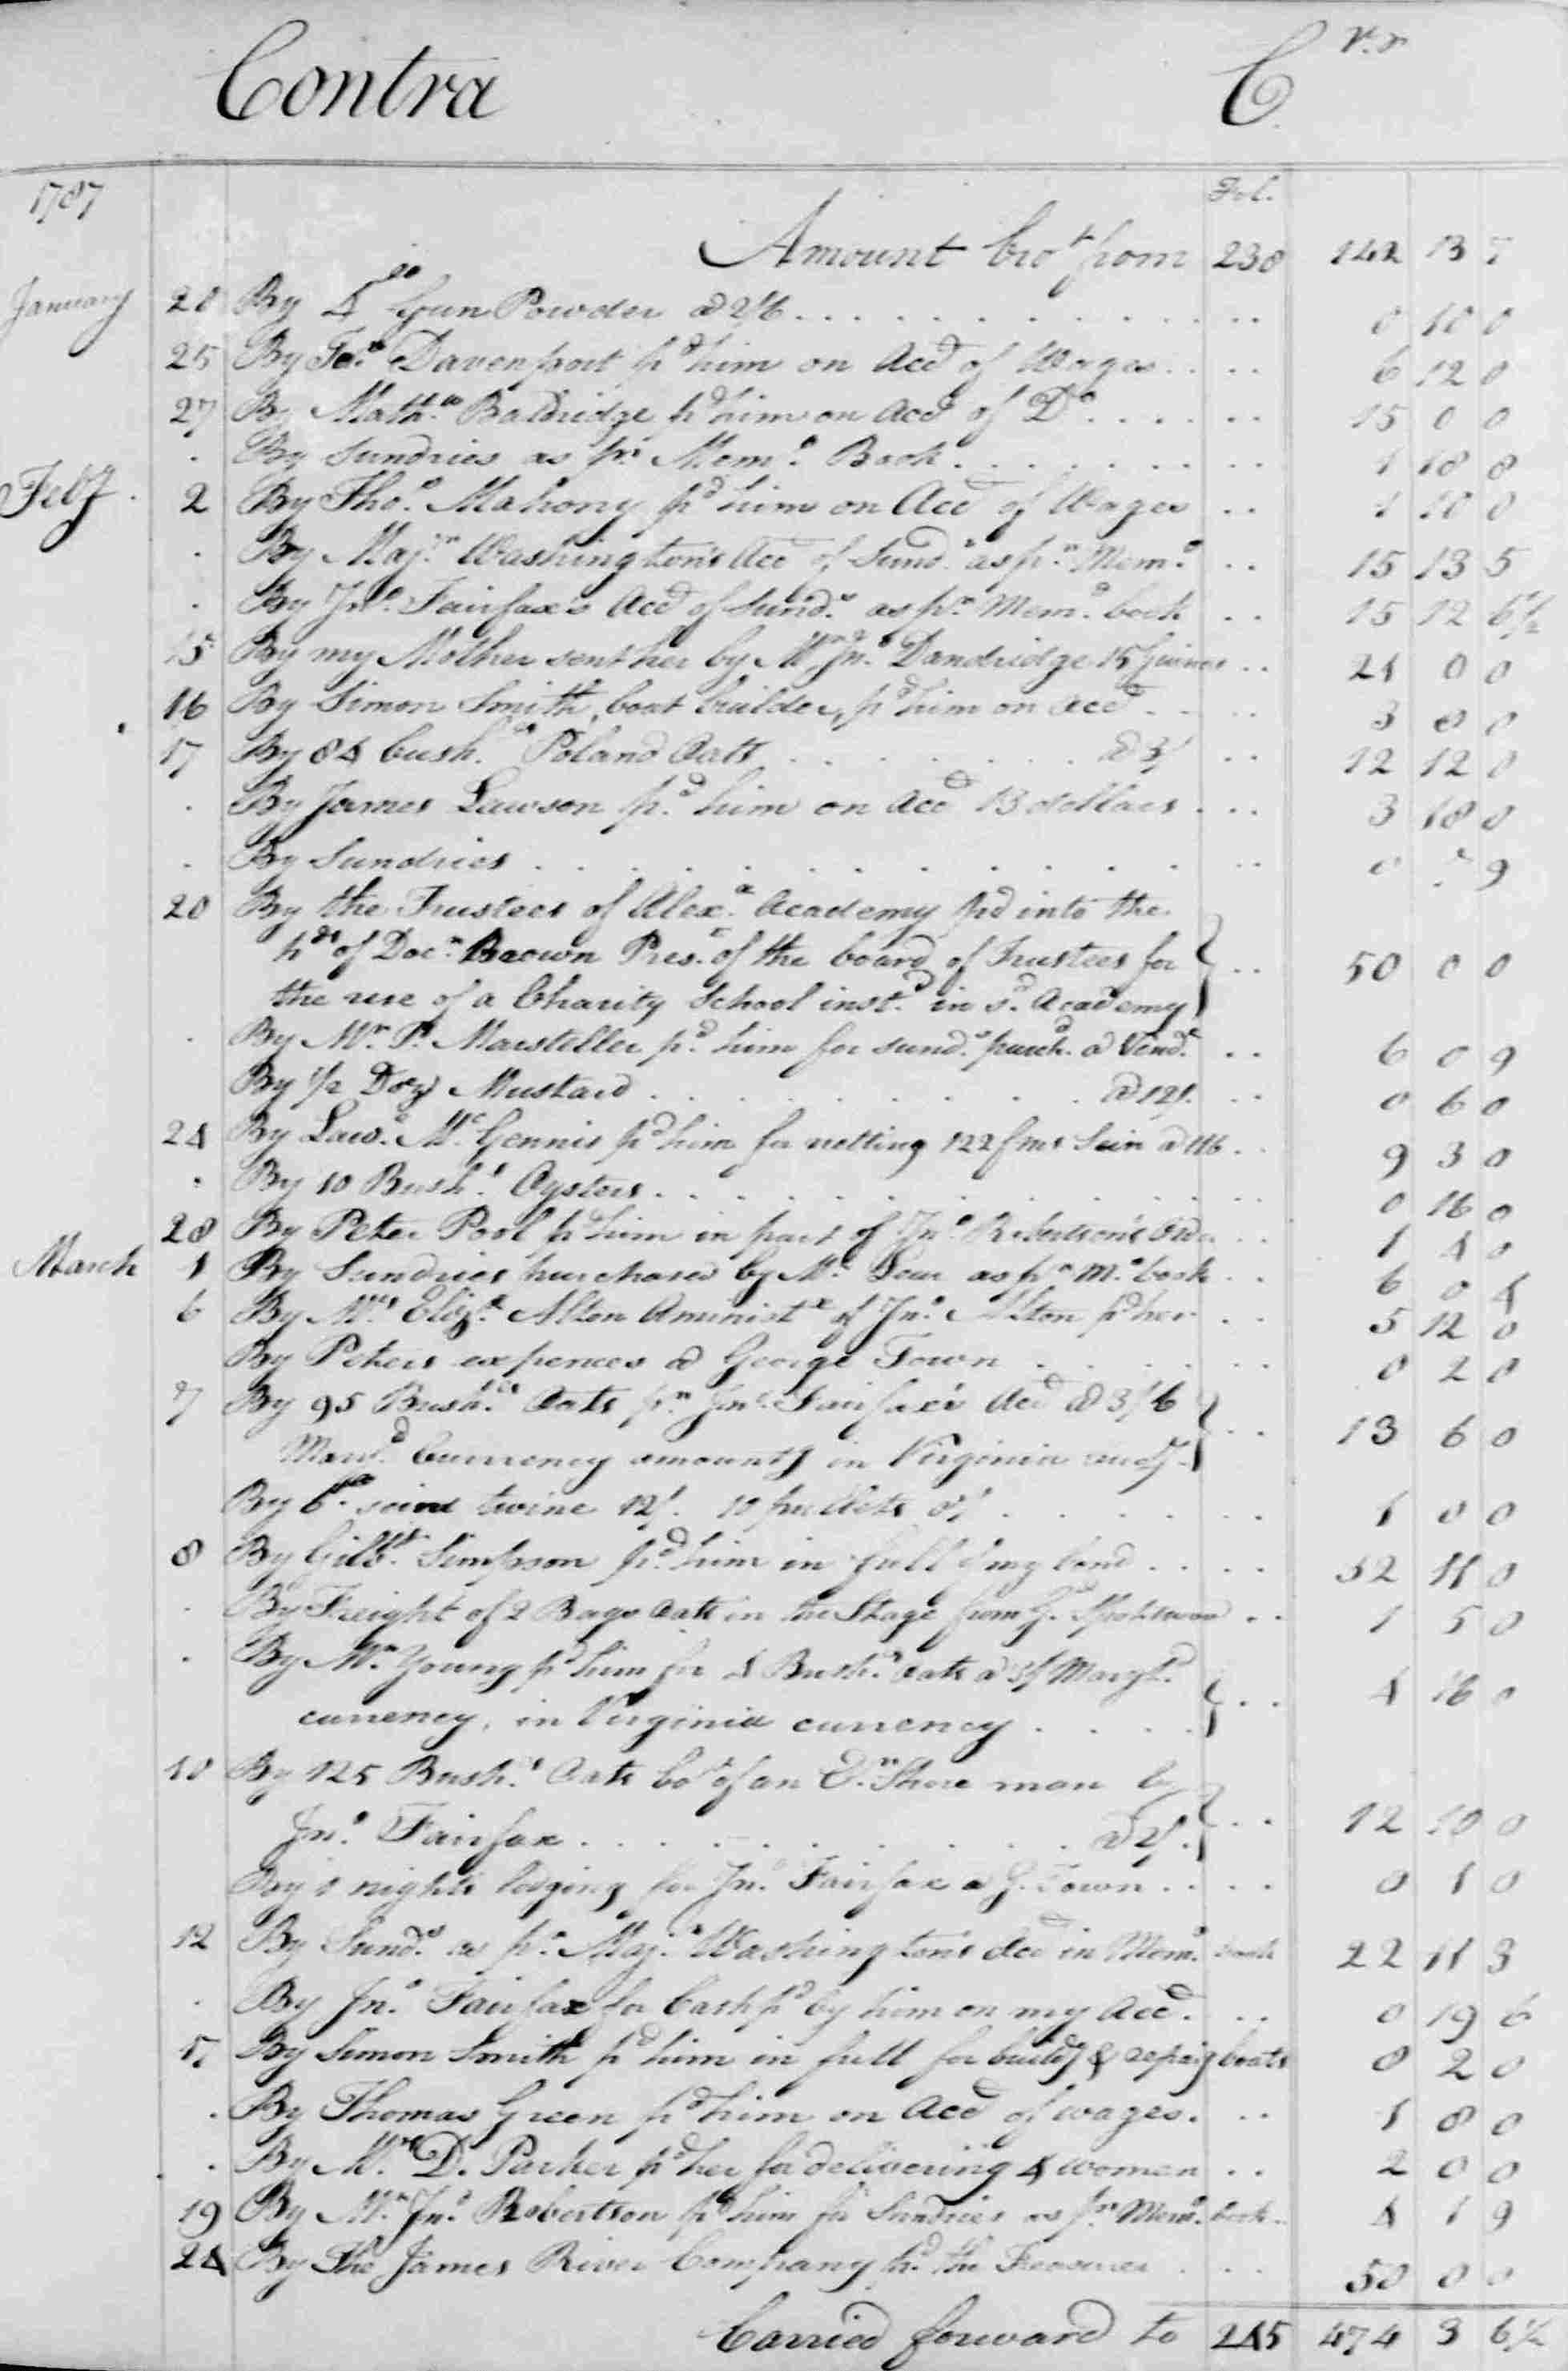 Ledger B, folio 242, right side